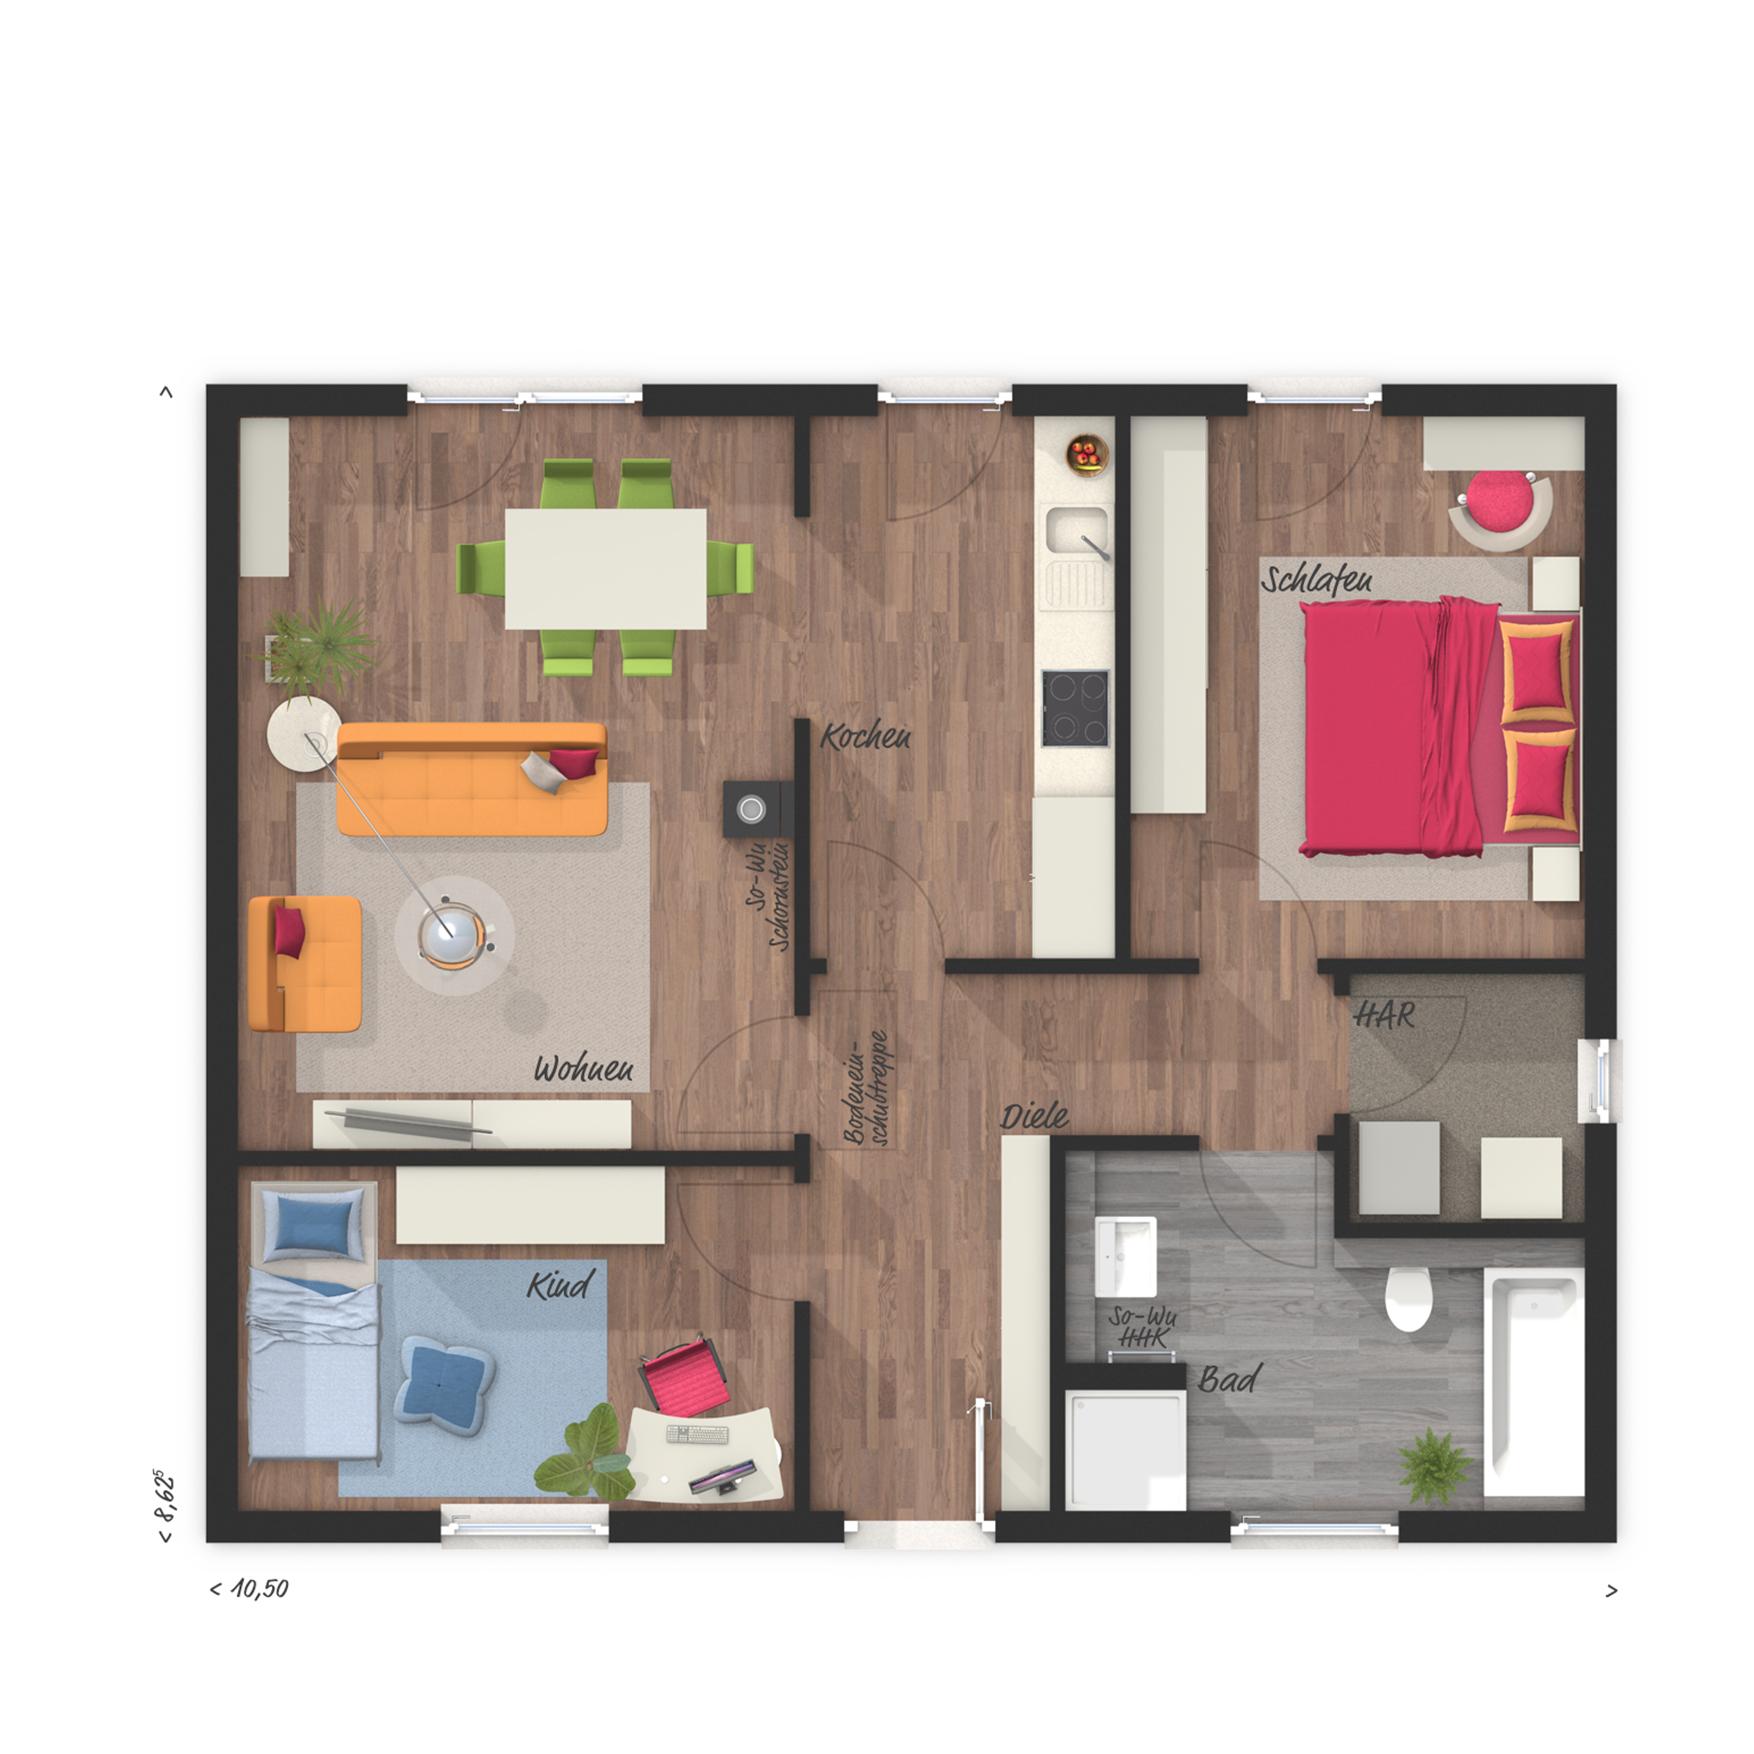 grundriss bungalow 4 zimmer offene k che k che klassisch poco weiss selber machen outdoor. Black Bedroom Furniture Sets. Home Design Ideas